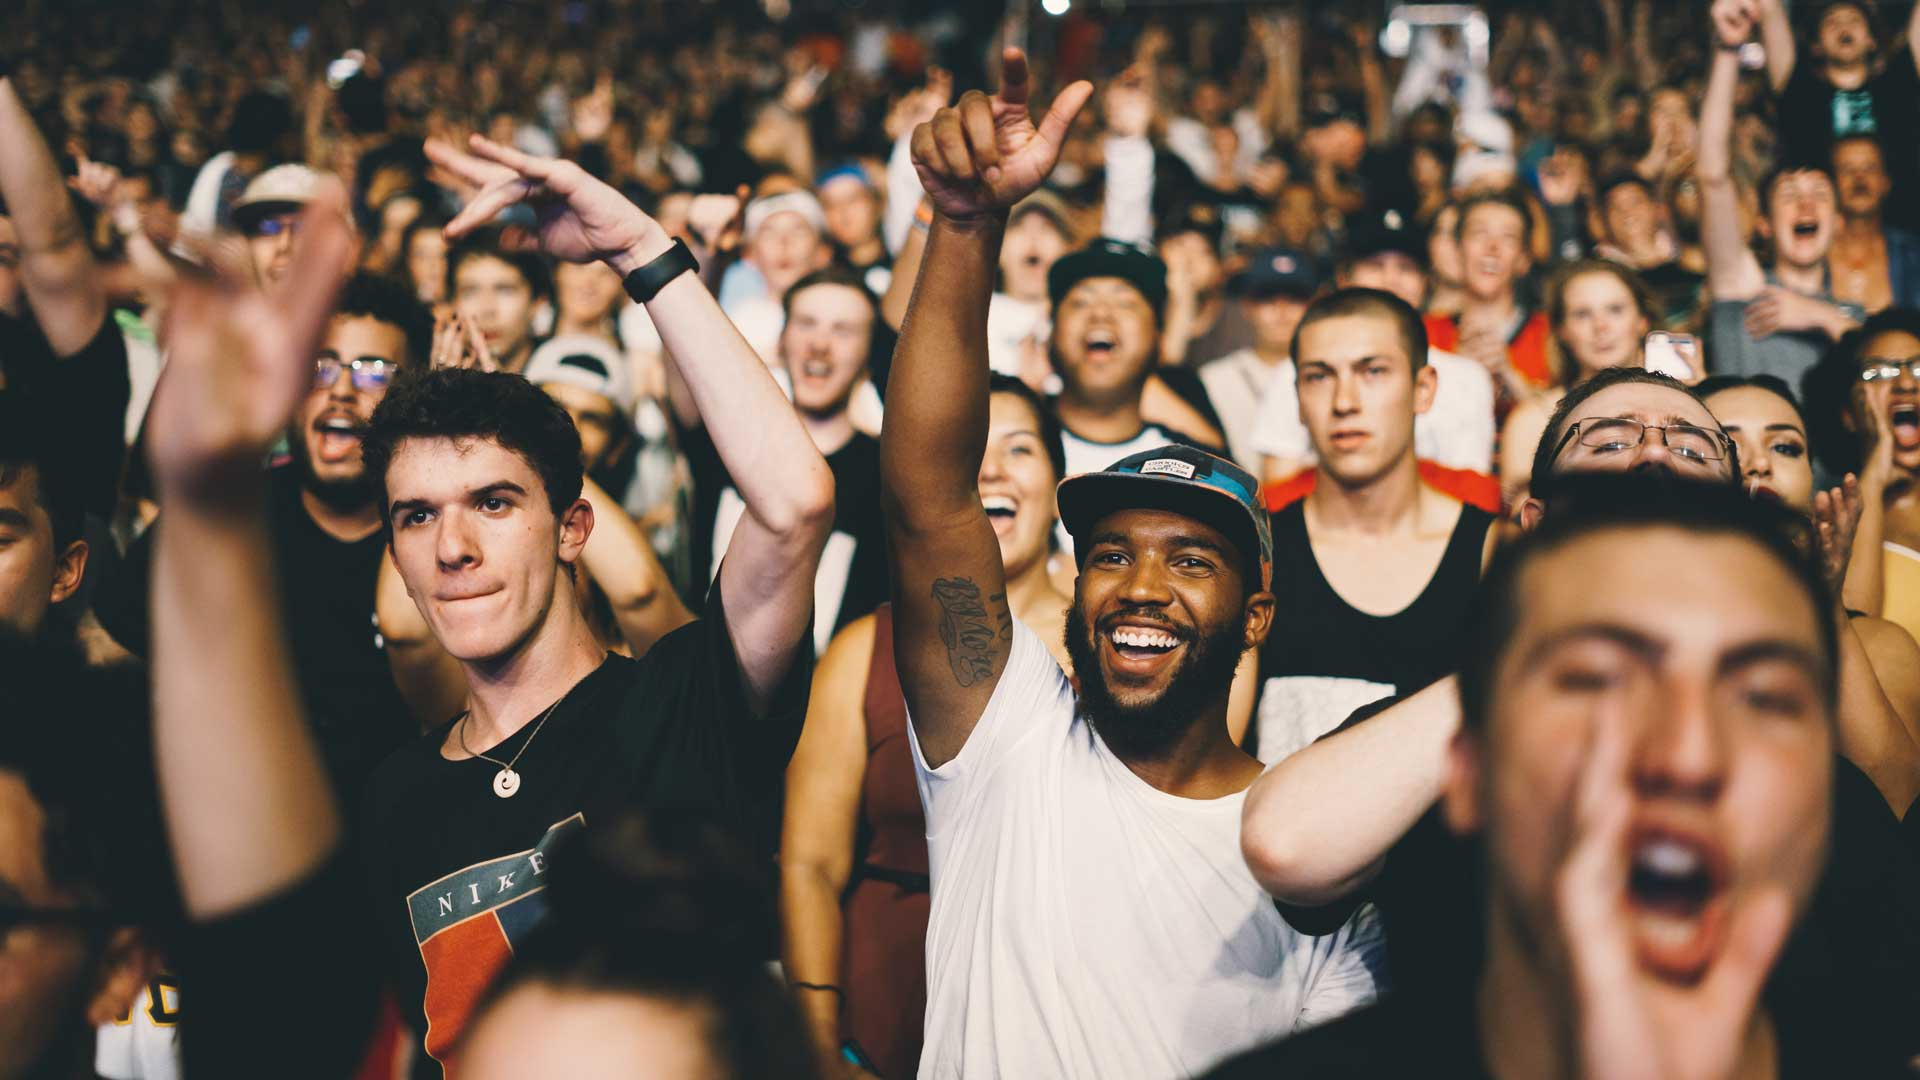 Smilende publikum